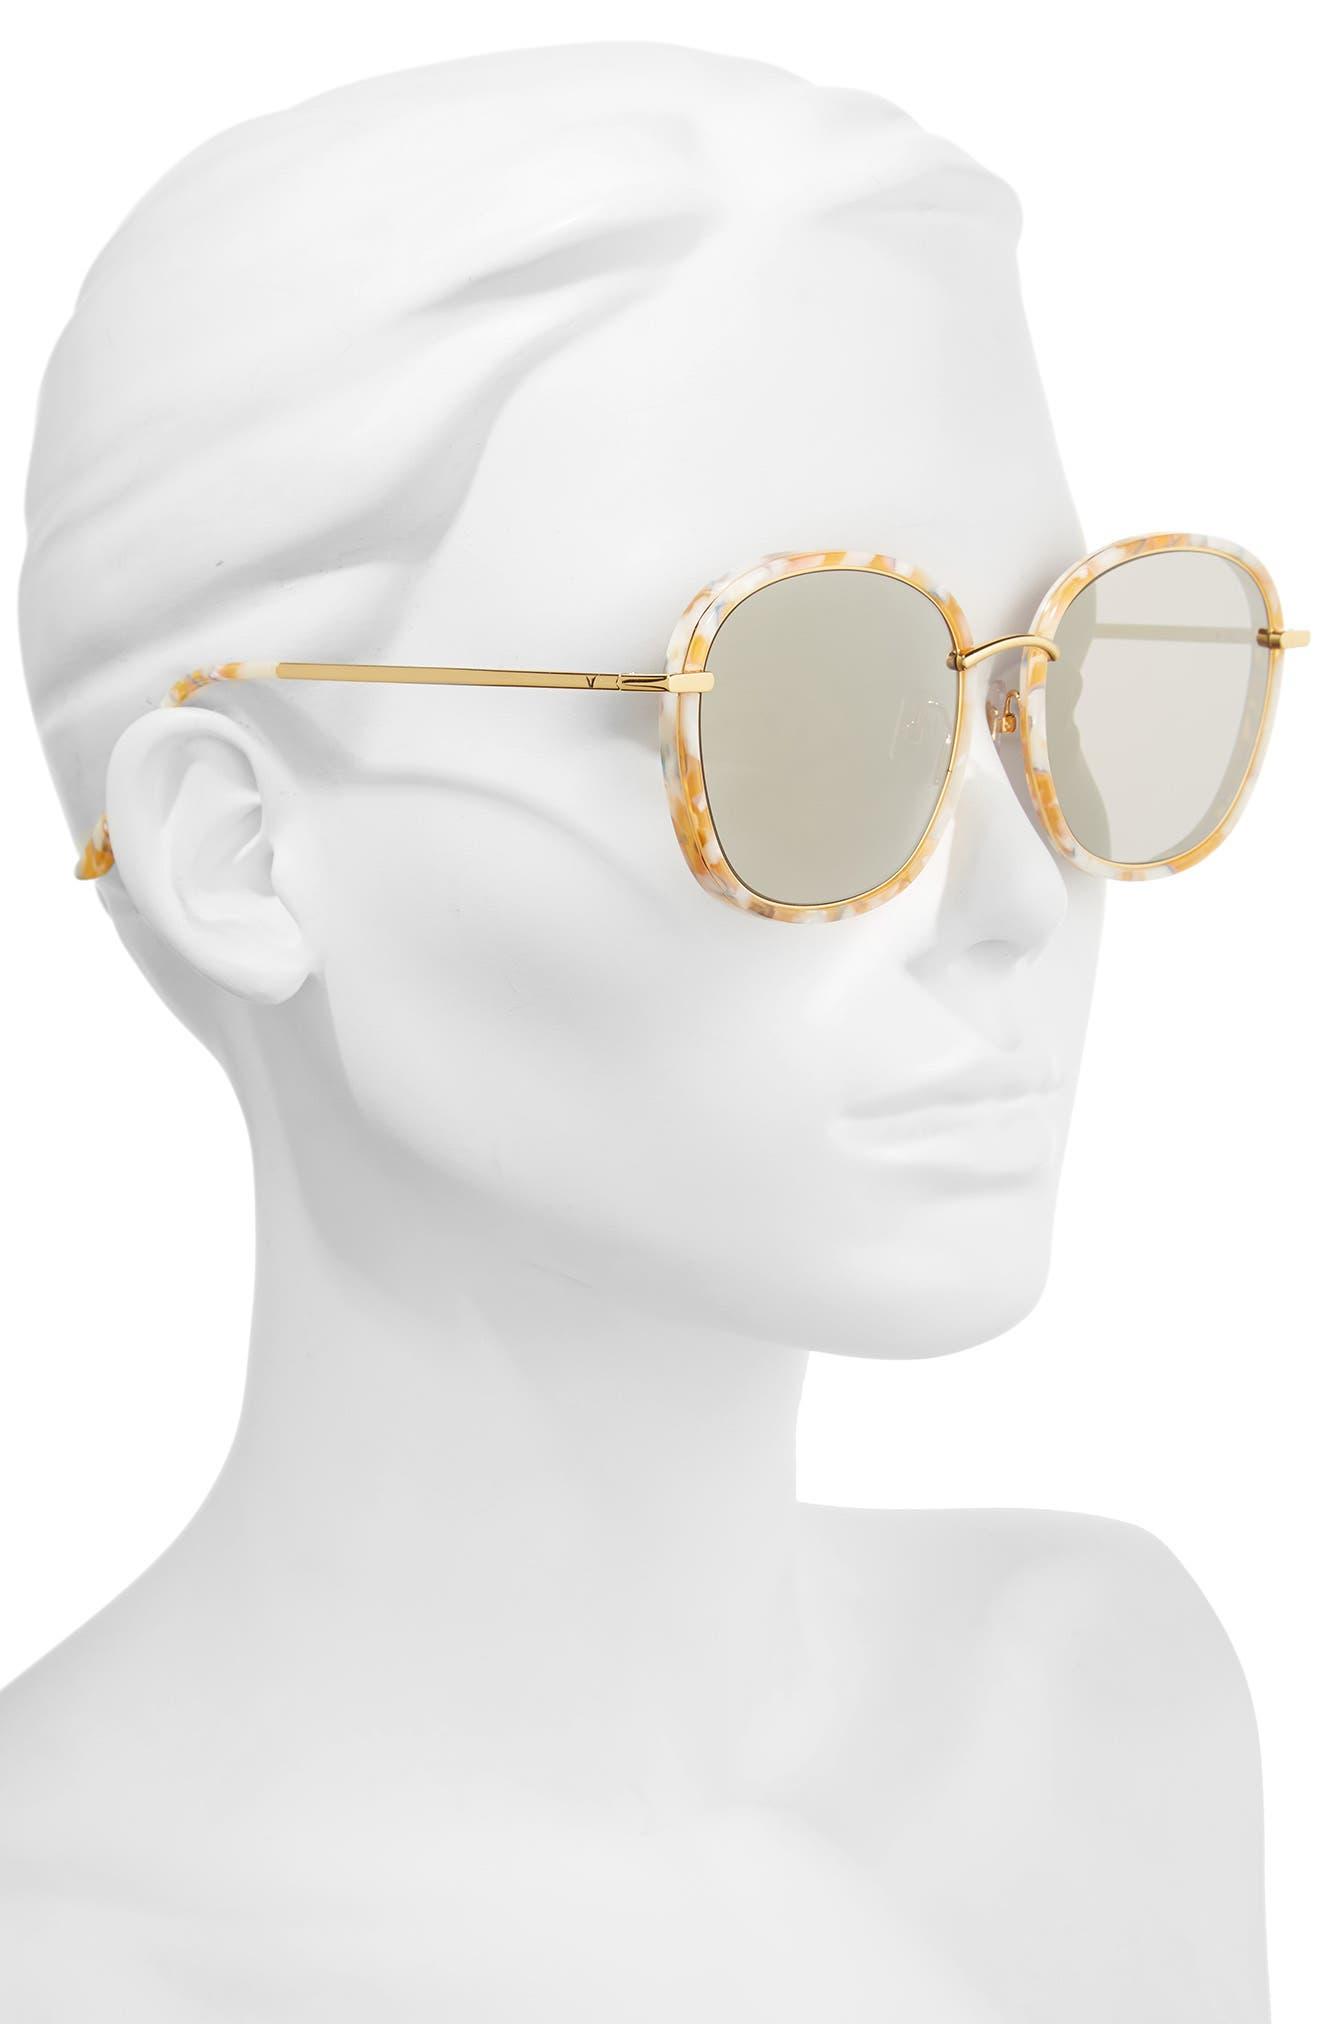 Mad Crush 57mm Round Sunglasses,                             Alternate thumbnail 2, color,                             800